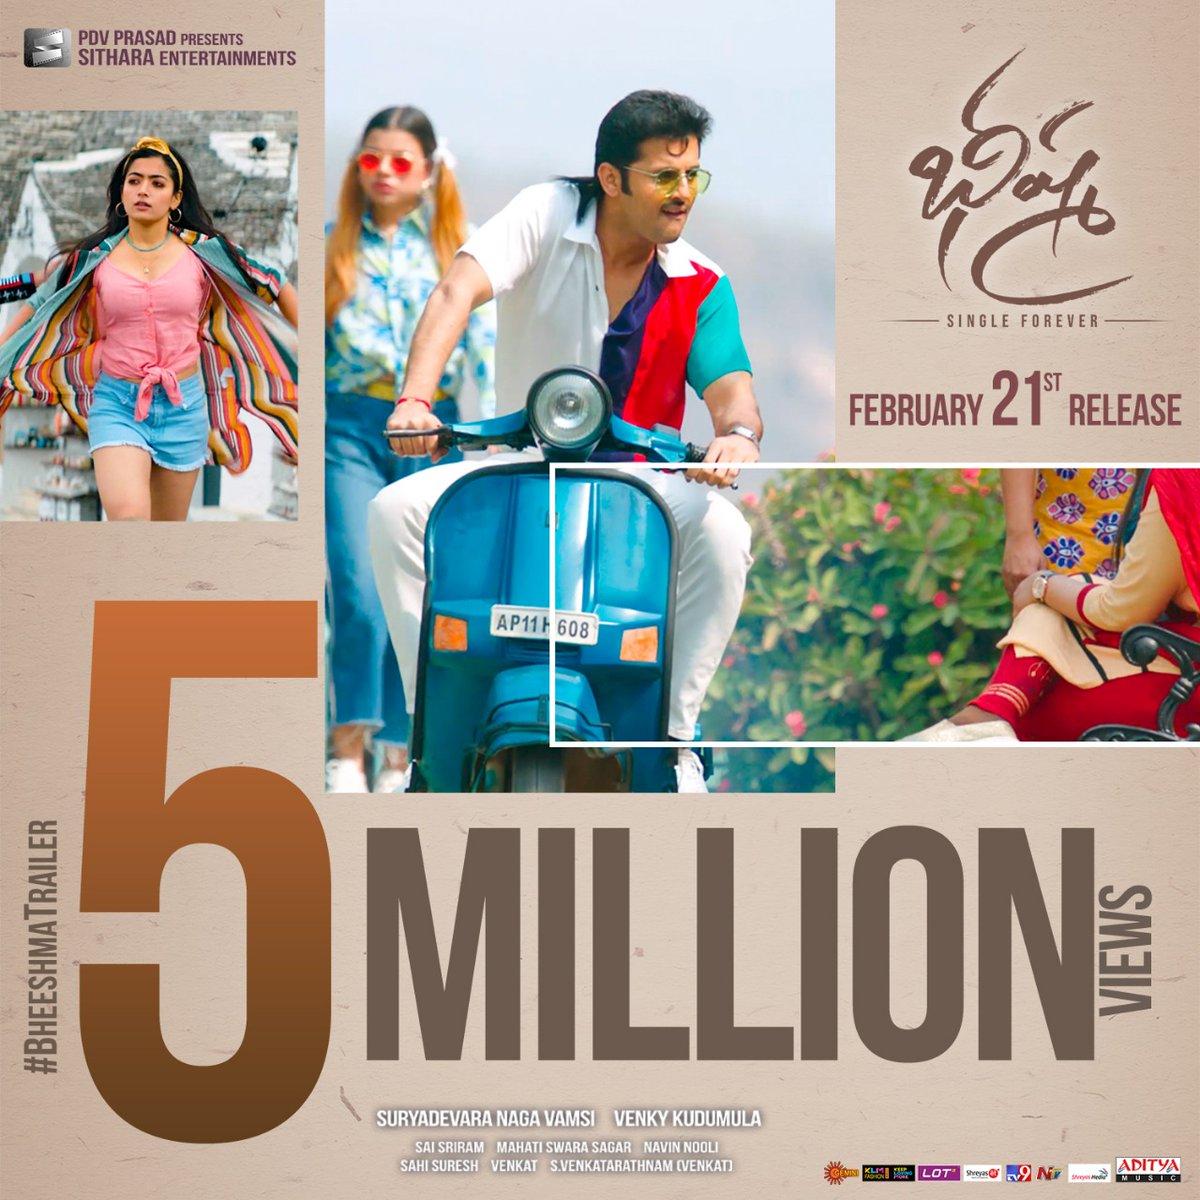 5 Million views & counting for #BheeshmaTrailer!! Watch #BheeshmaOnFeb21st at your nearest theatres!  ICYMI -   @actor_nithiin @iamRashmika @VenkyKudumula @mahathi_sagar  @vamsi84 @adityamusic @sitharaents